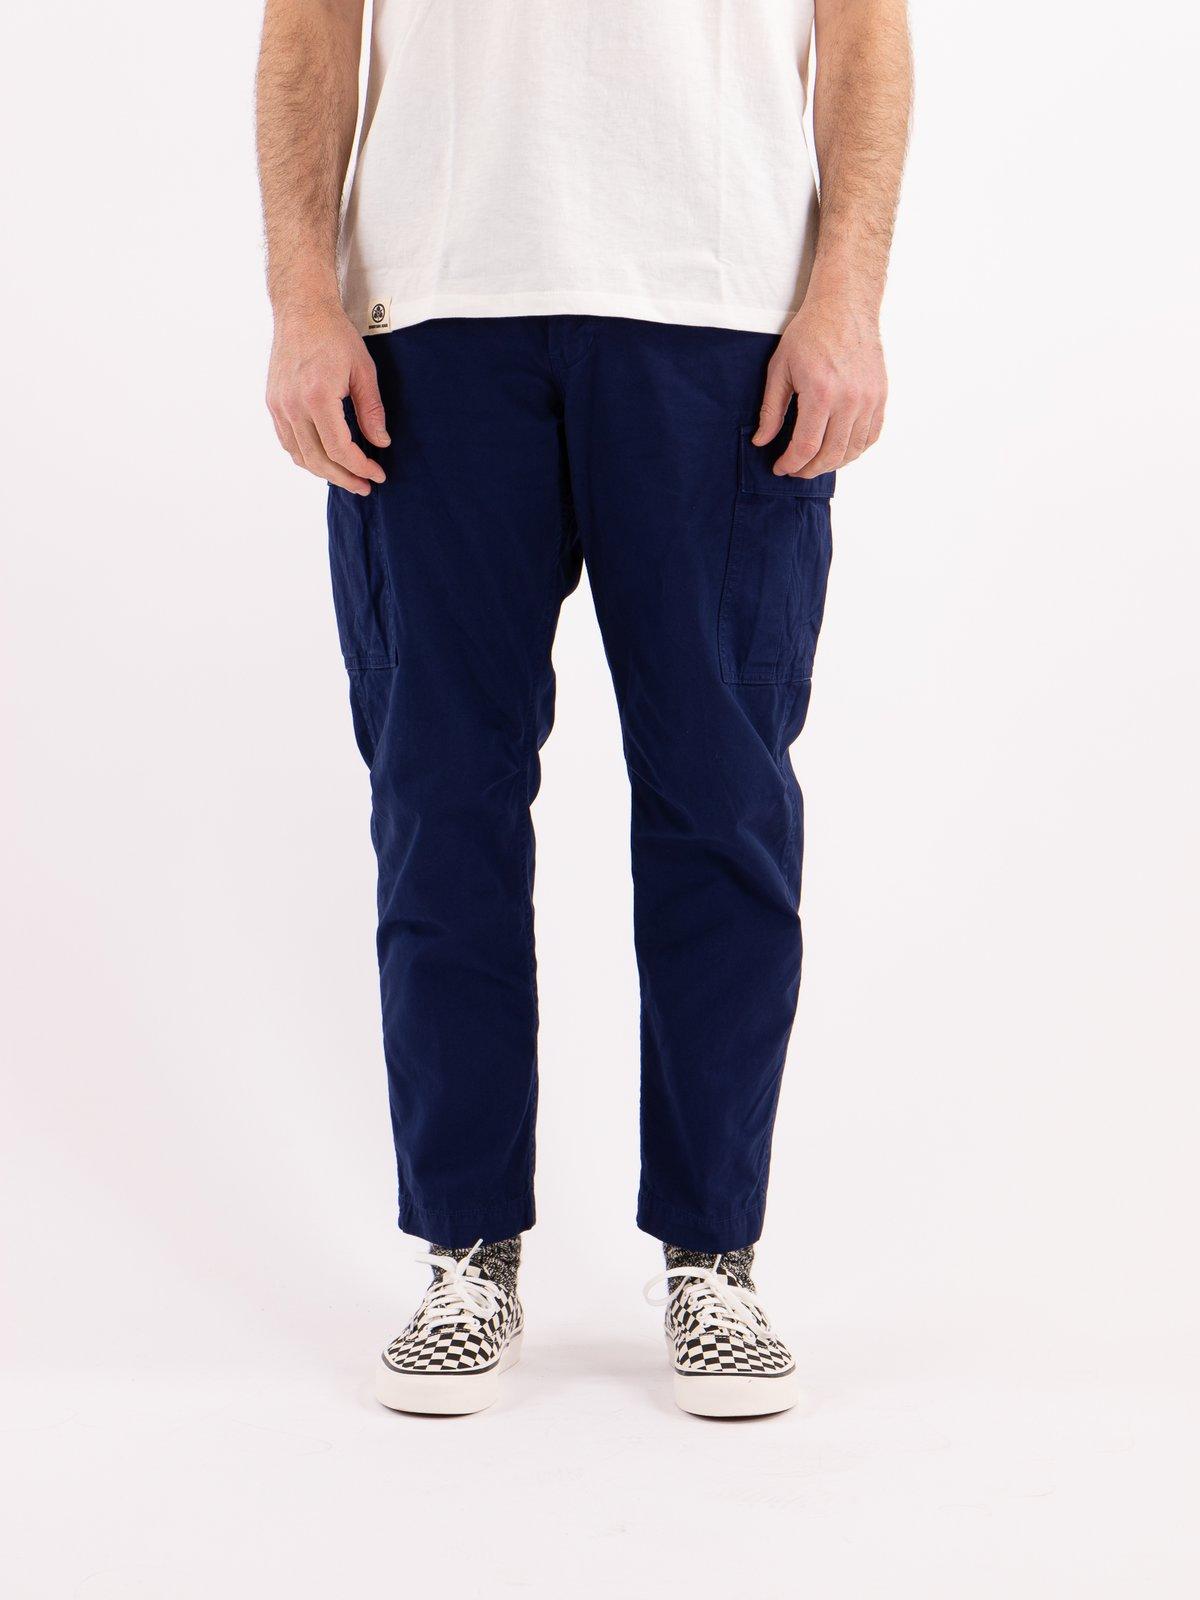 Ink Blue Poplin Easy Cargo Pant - Image 2